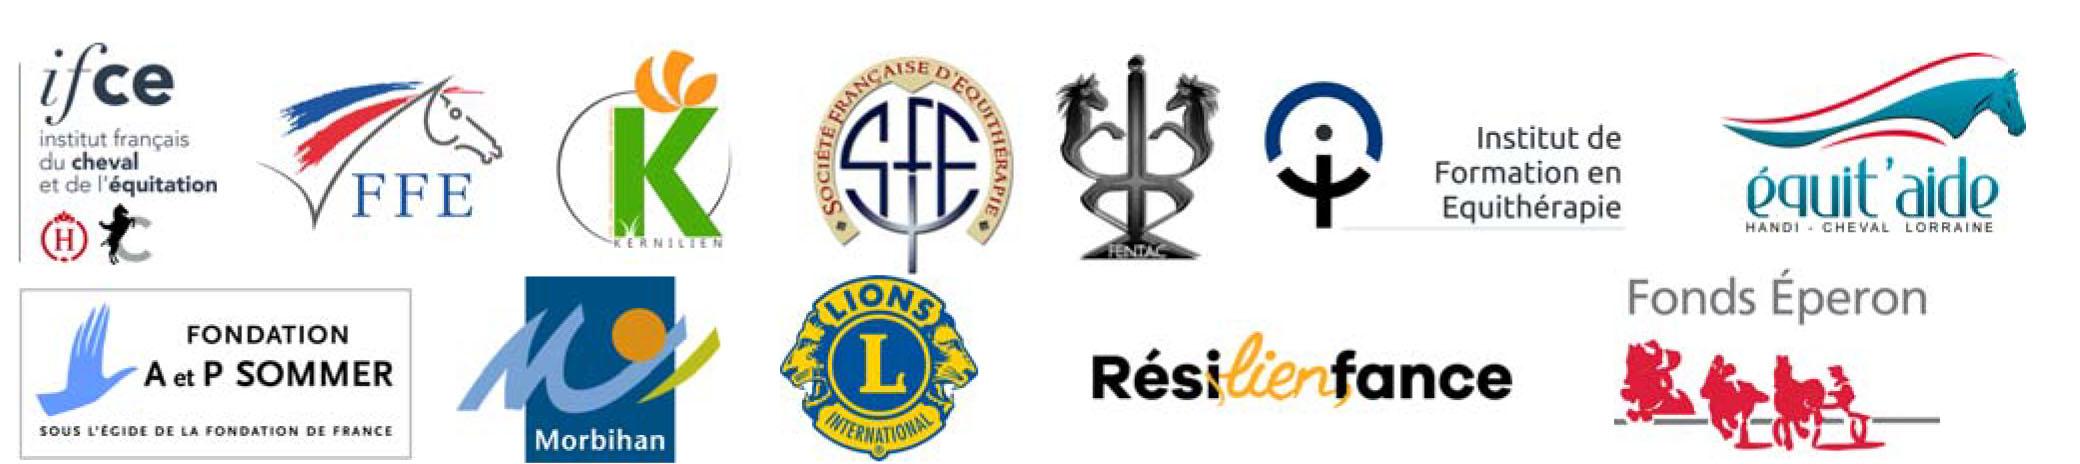 logos partenaires equimeeting mediation 2018